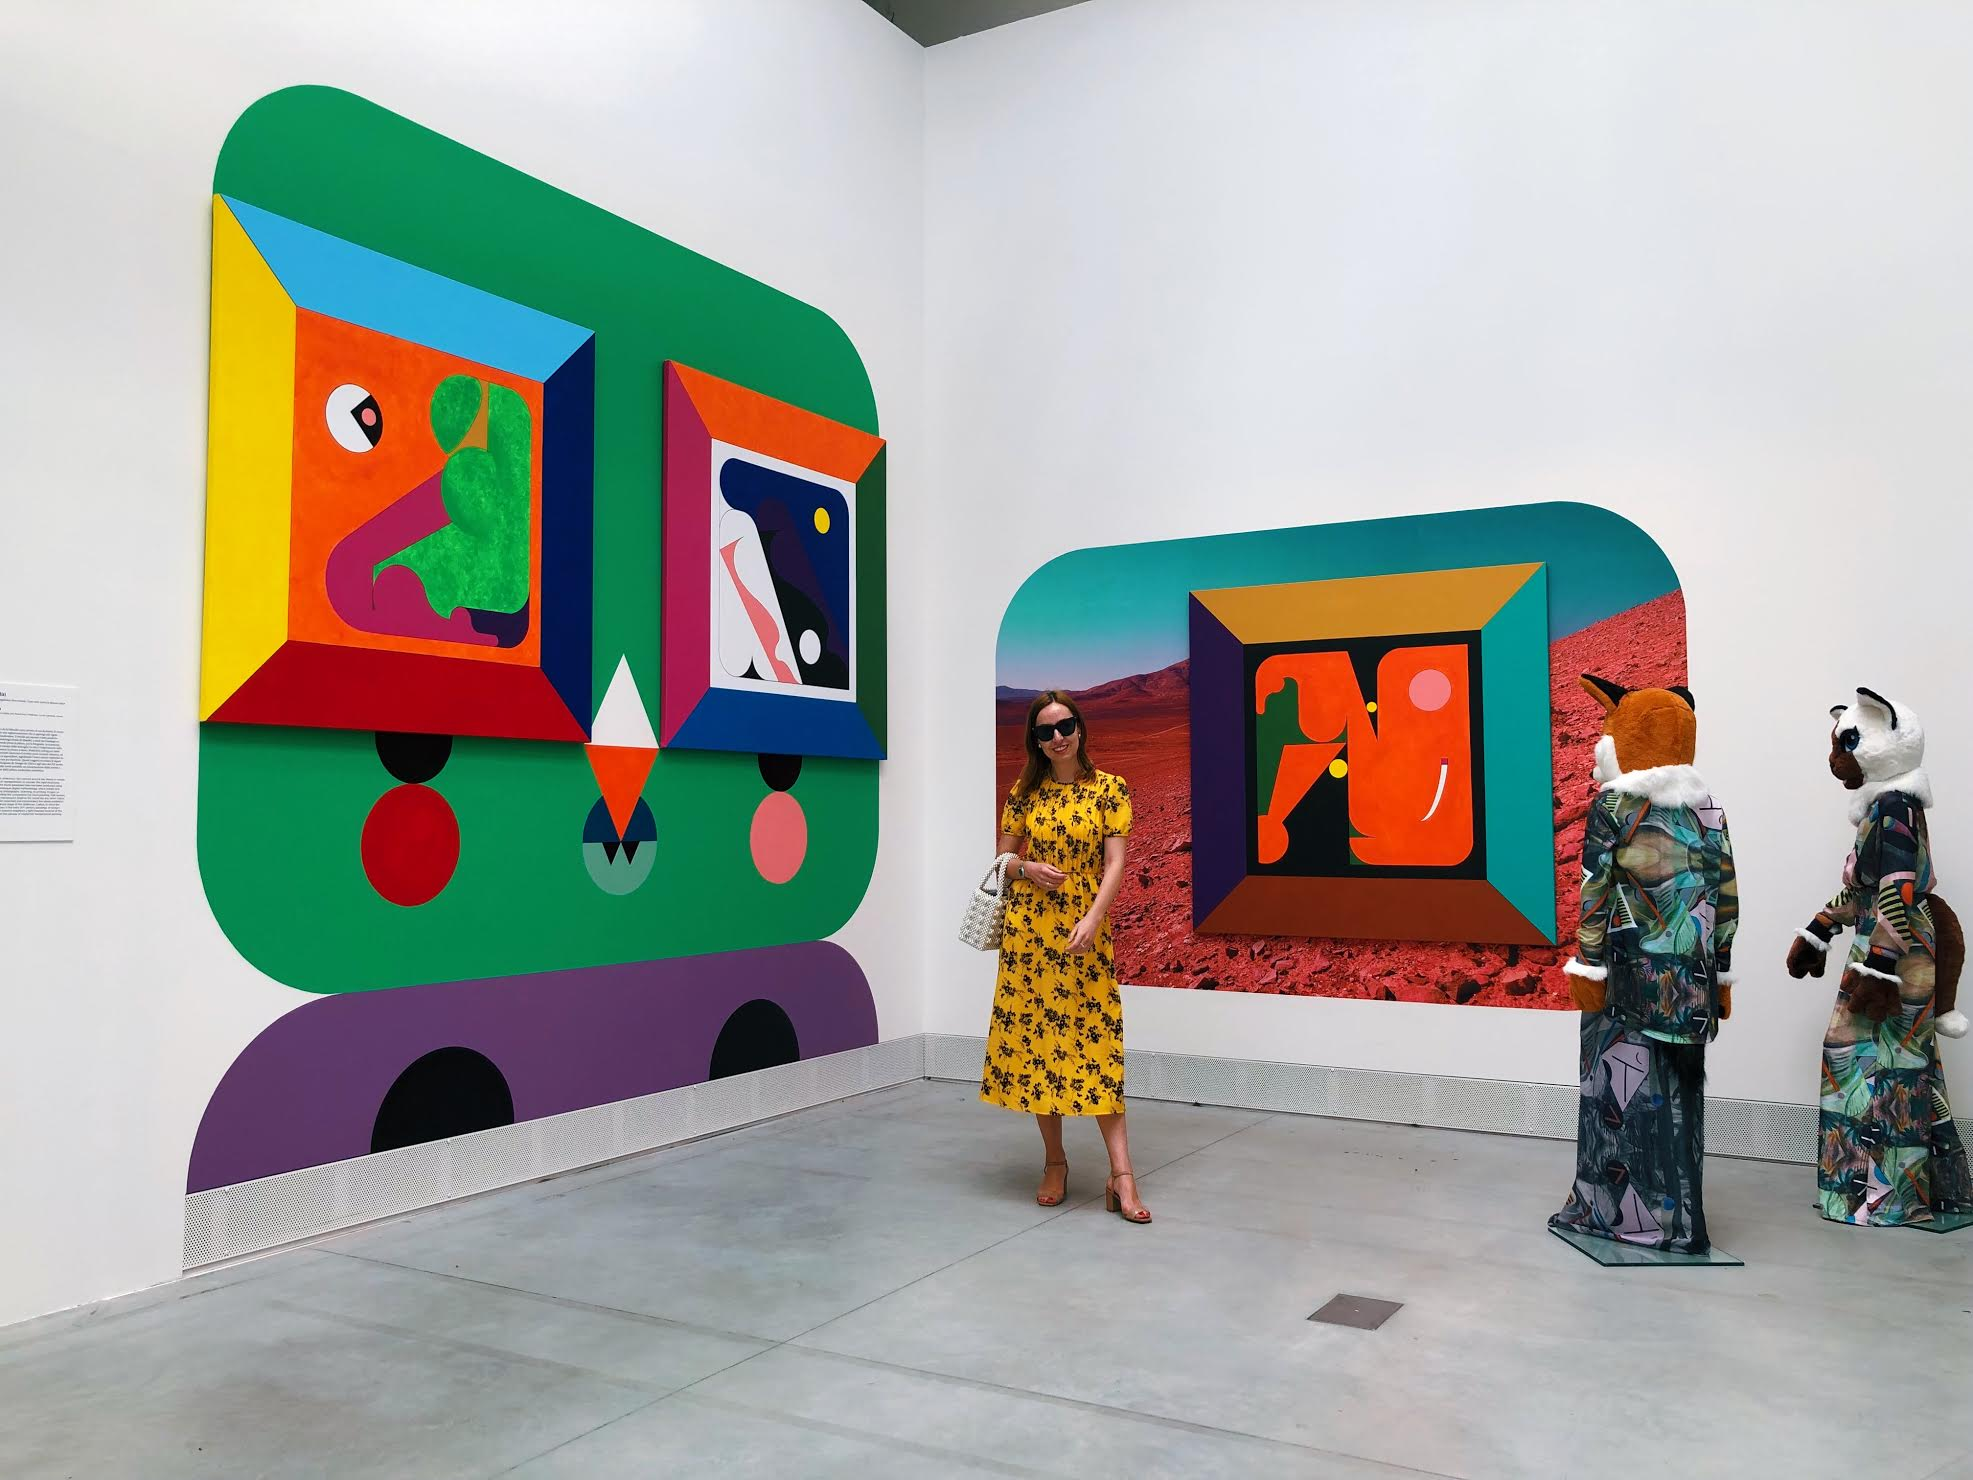 Ad Minoliti 'Mural' , 2019 atVenice Biennale.